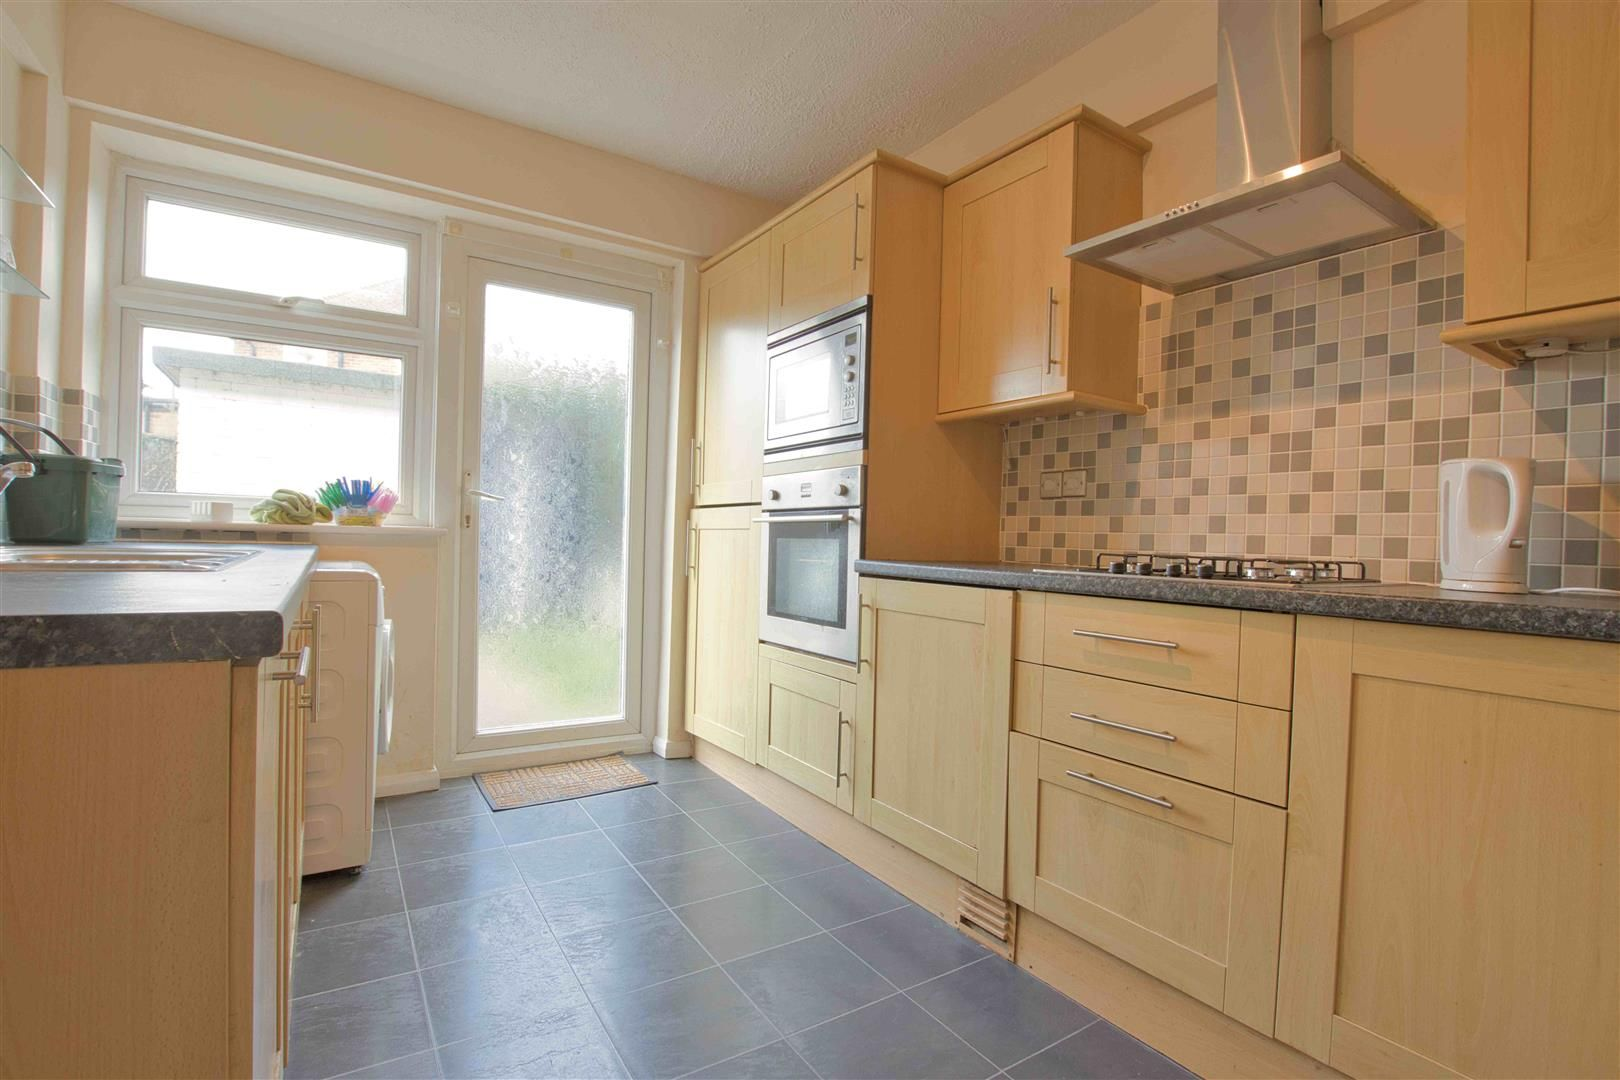 Property photo 1 of 8. Kitchen/Breakfast Room